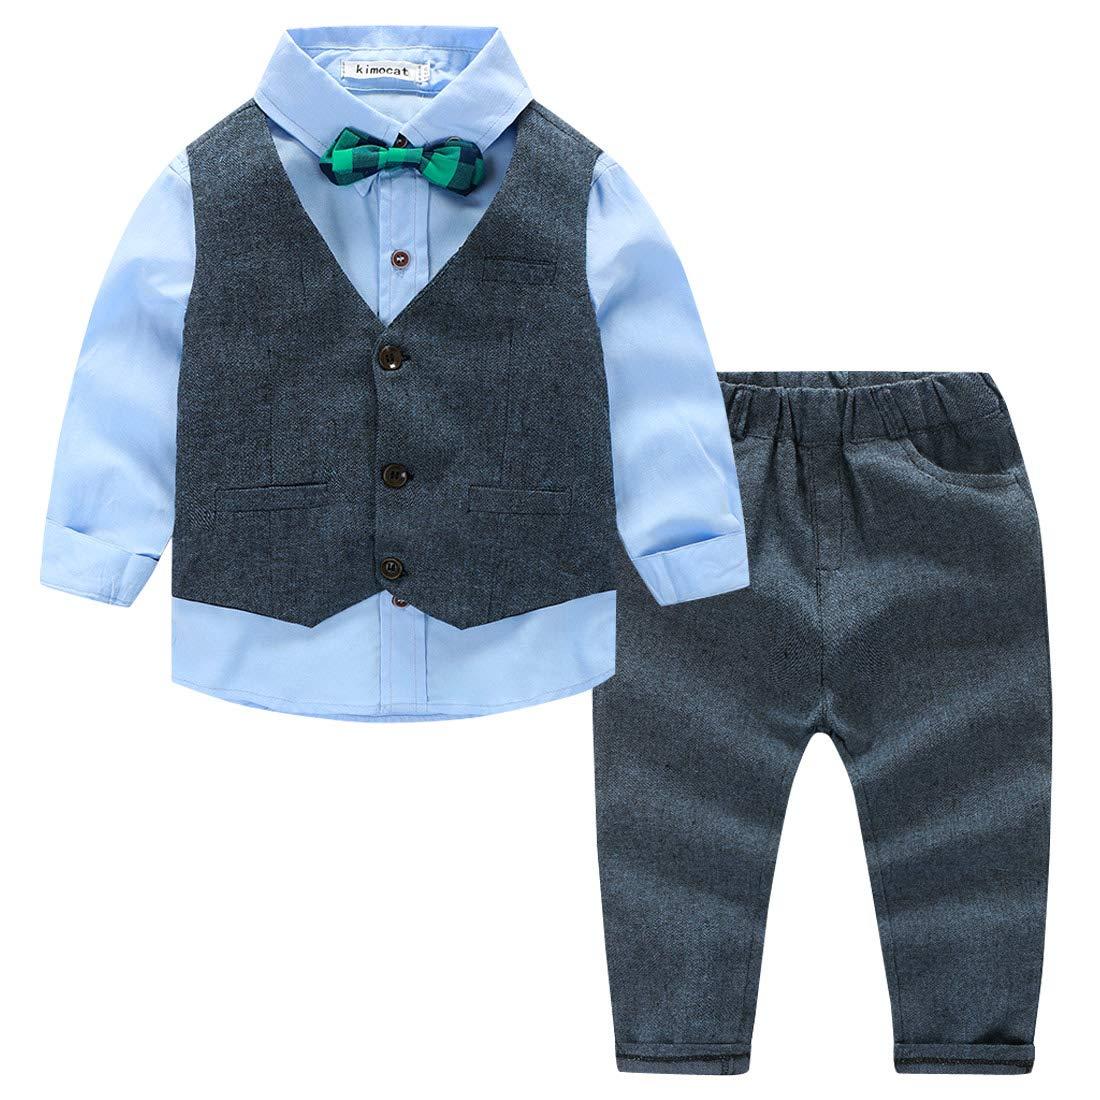 b698e2ed0cf22 Kimocat Babyanzug Baby Taufanzug Jungen Hemd Hose Anzug Festlich  Kinderanzug Hochzeit Anzug Frühling Herbst Bekleidung Set